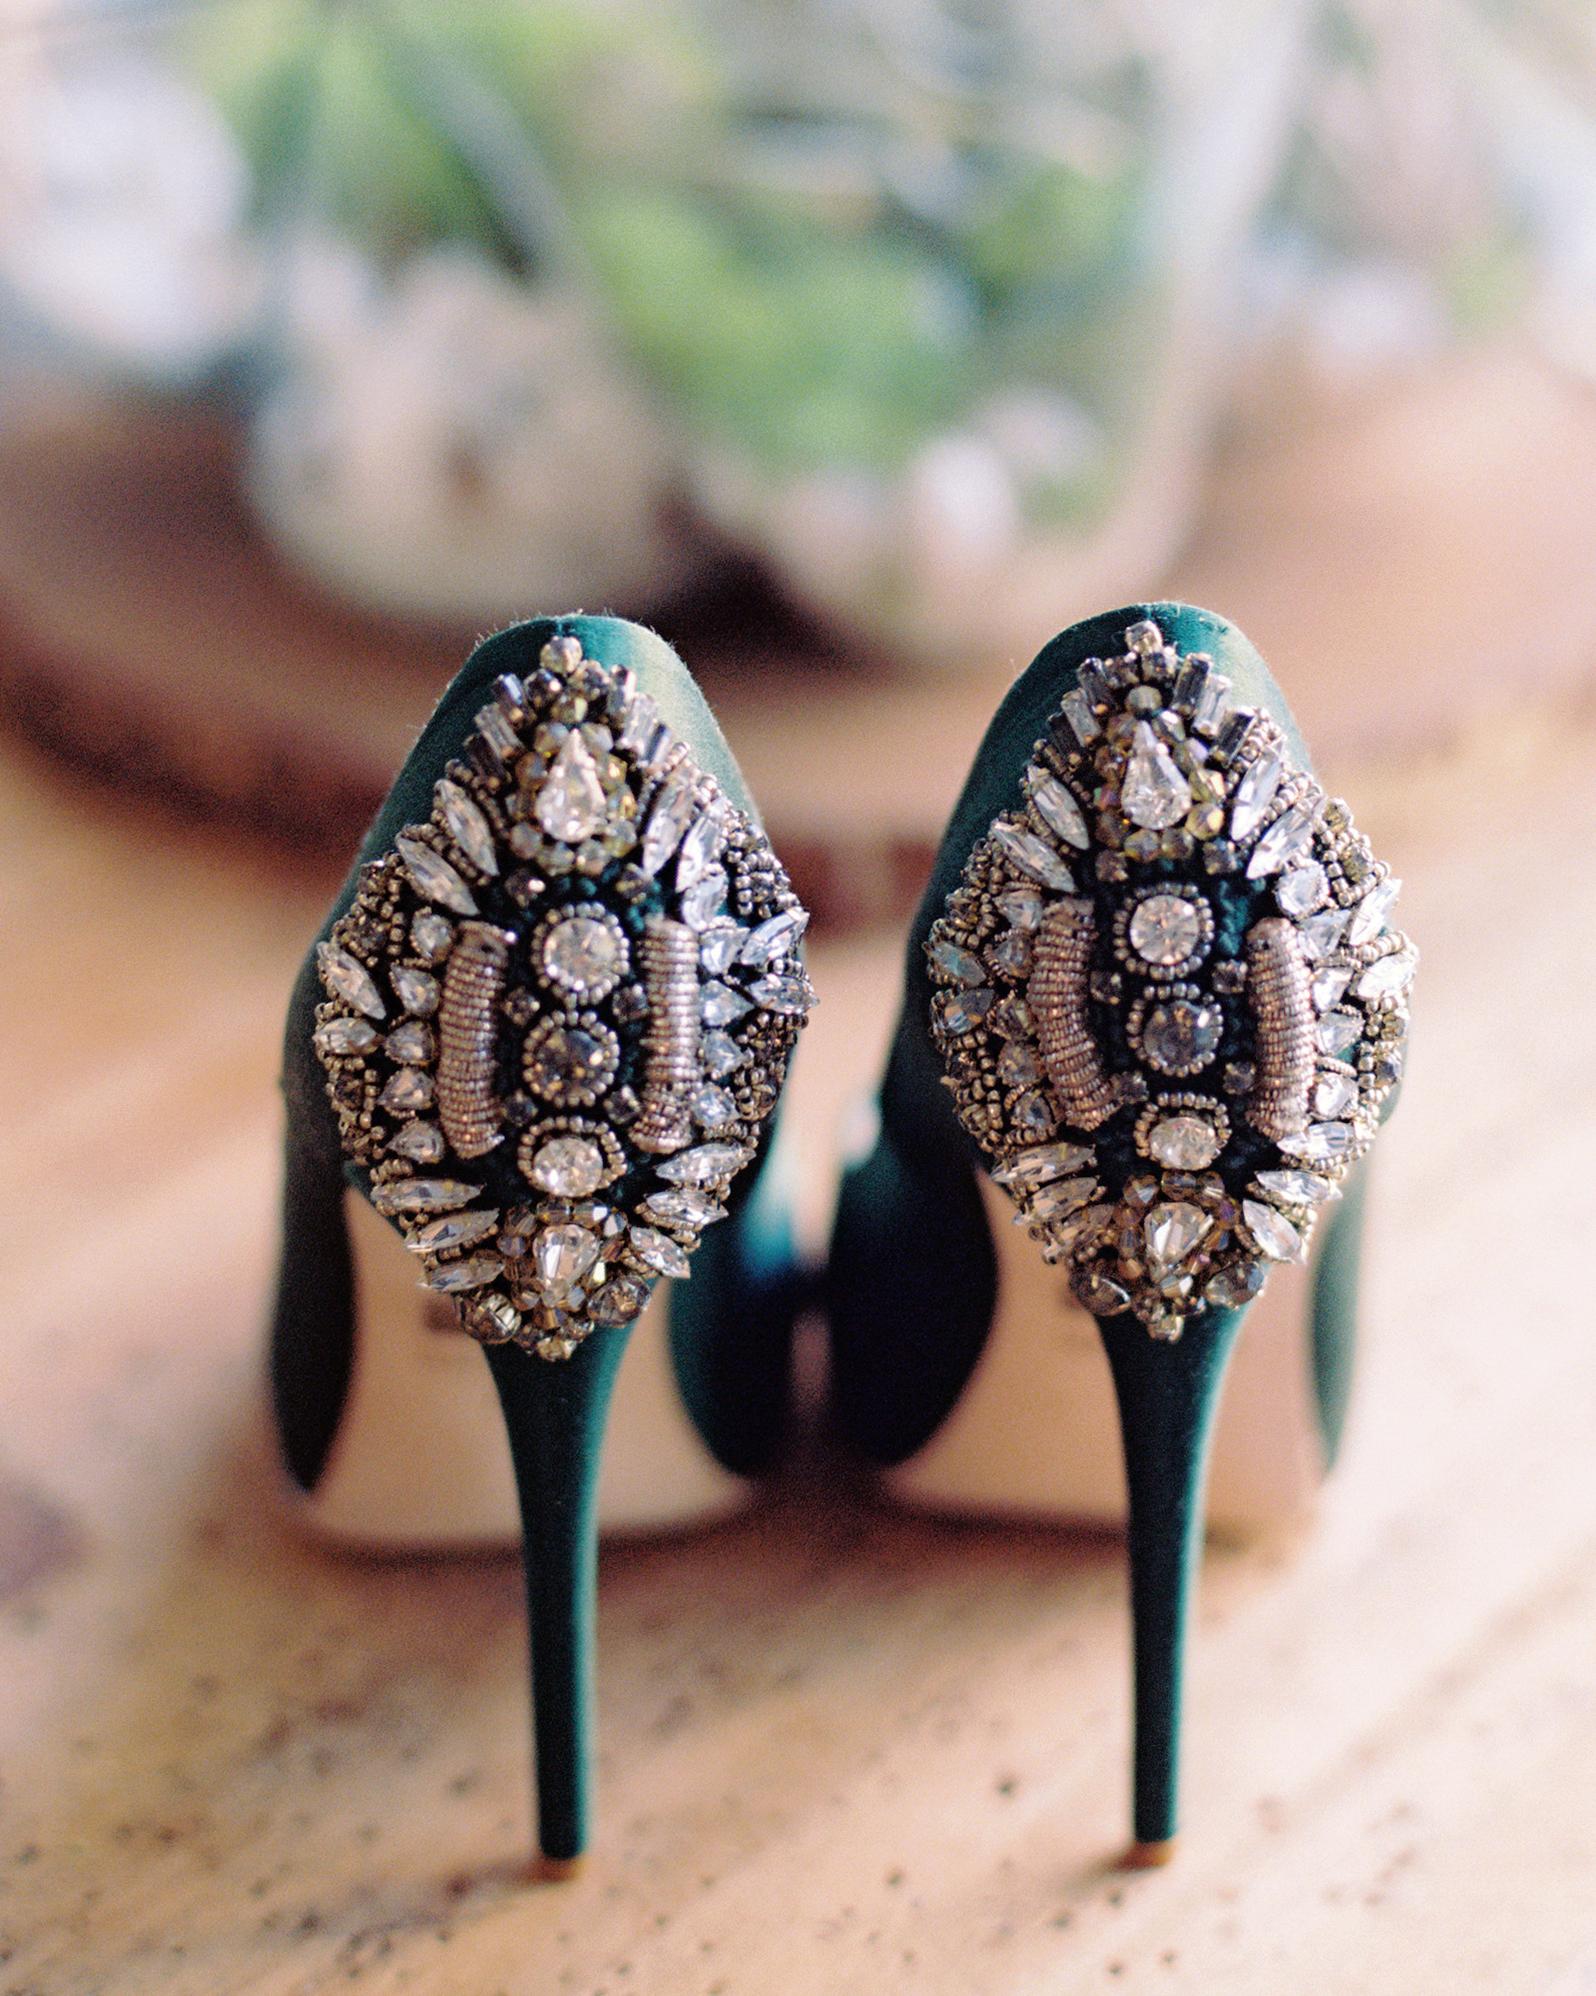 shannon-ryan-wedding-shoes-2-s111853-0415.jpg